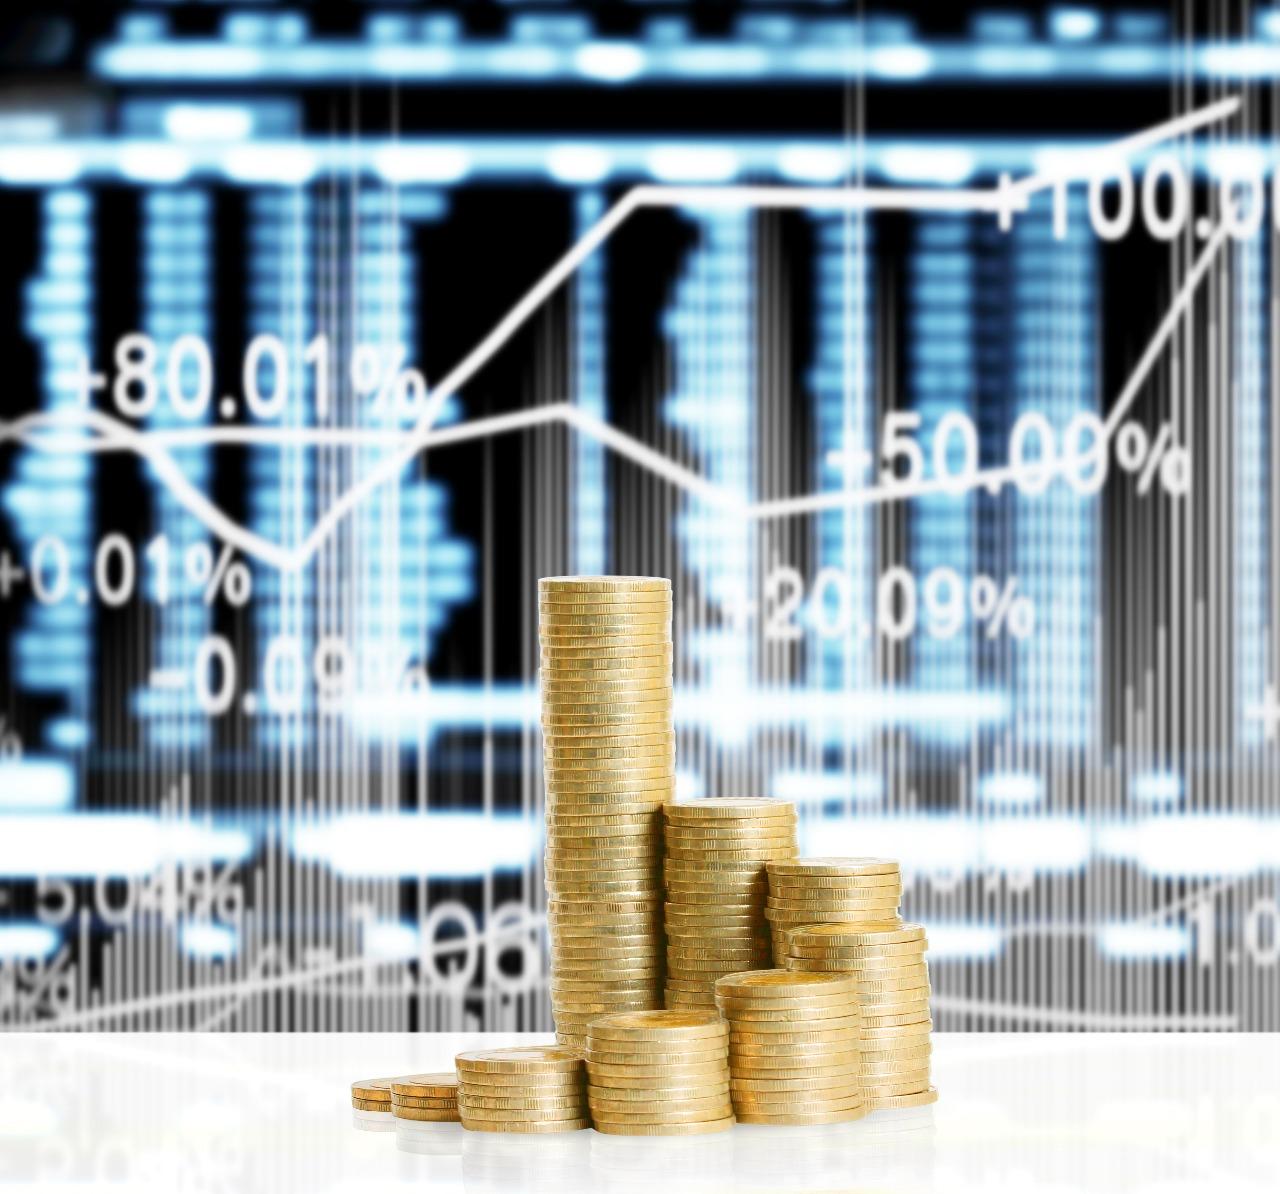 https: img-k.okeinfo.net content 2019 11 20 20 2132140 incar-nilai-perdagangan-usd7-triliun-pertumbuhan-ekonomi-5-tak-cukup-nd7QIxHAPF.jpg